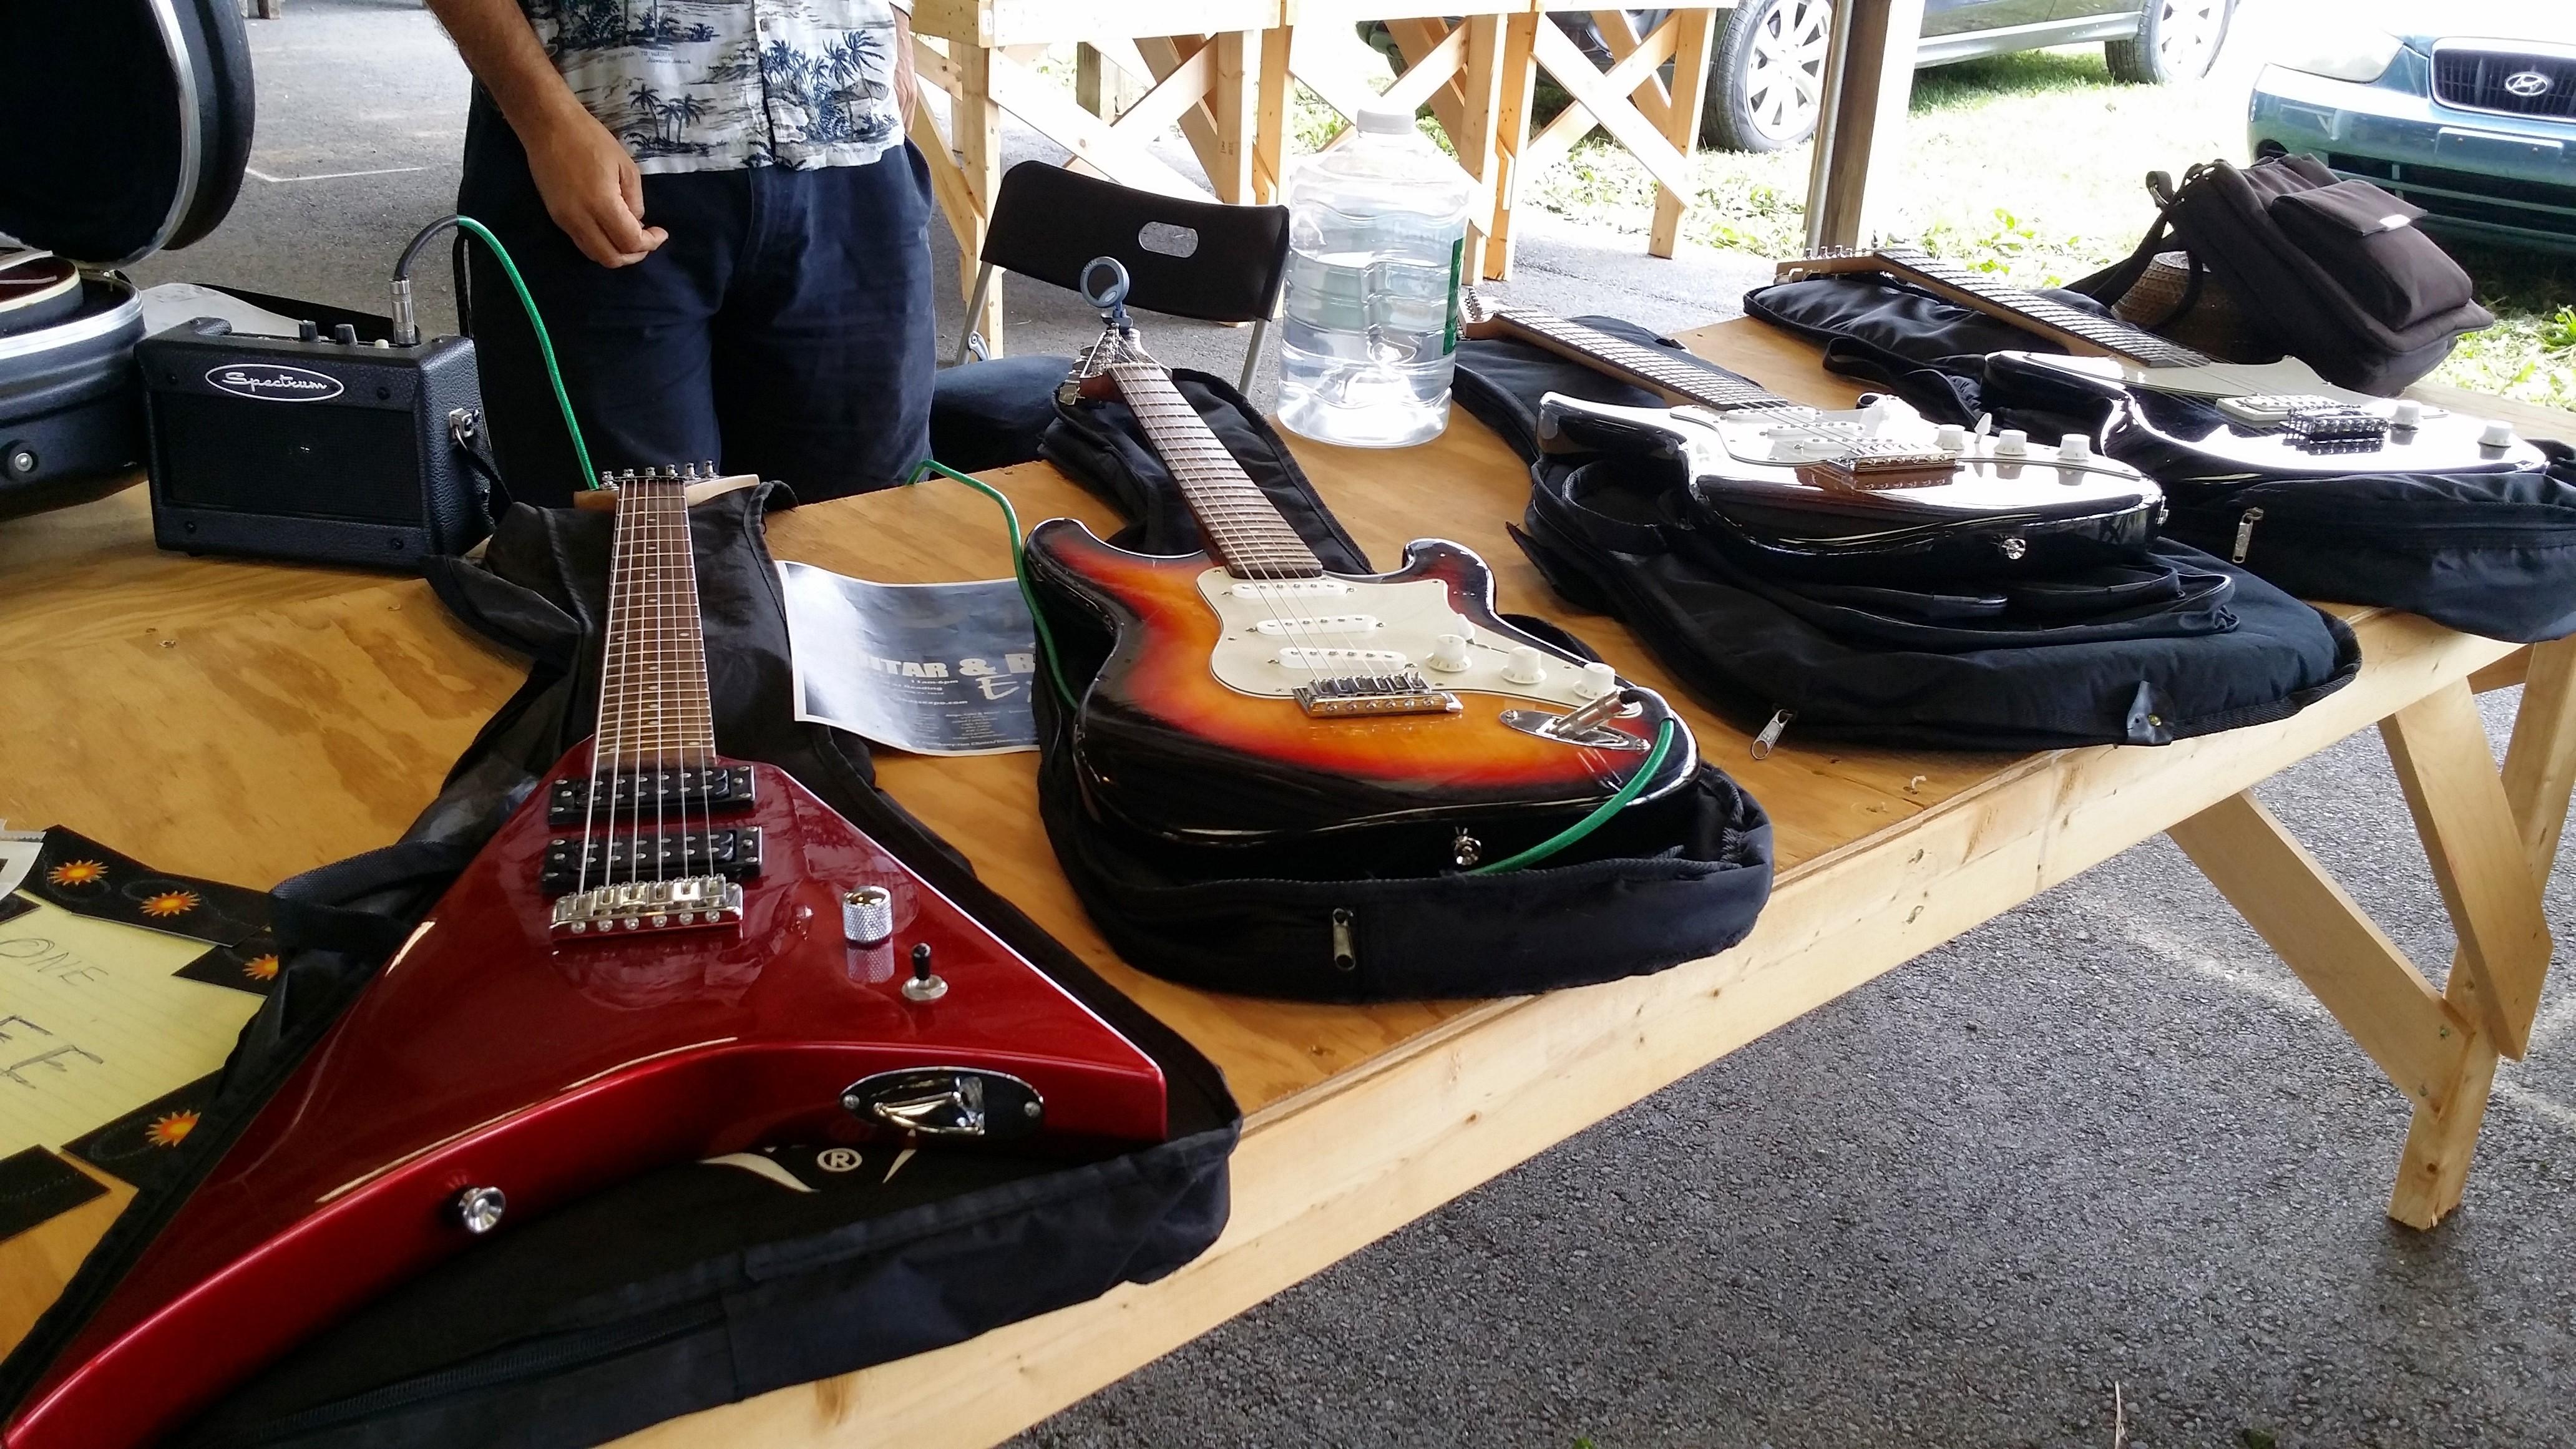 2014 Musician Swapmeets in Kutztown, PA